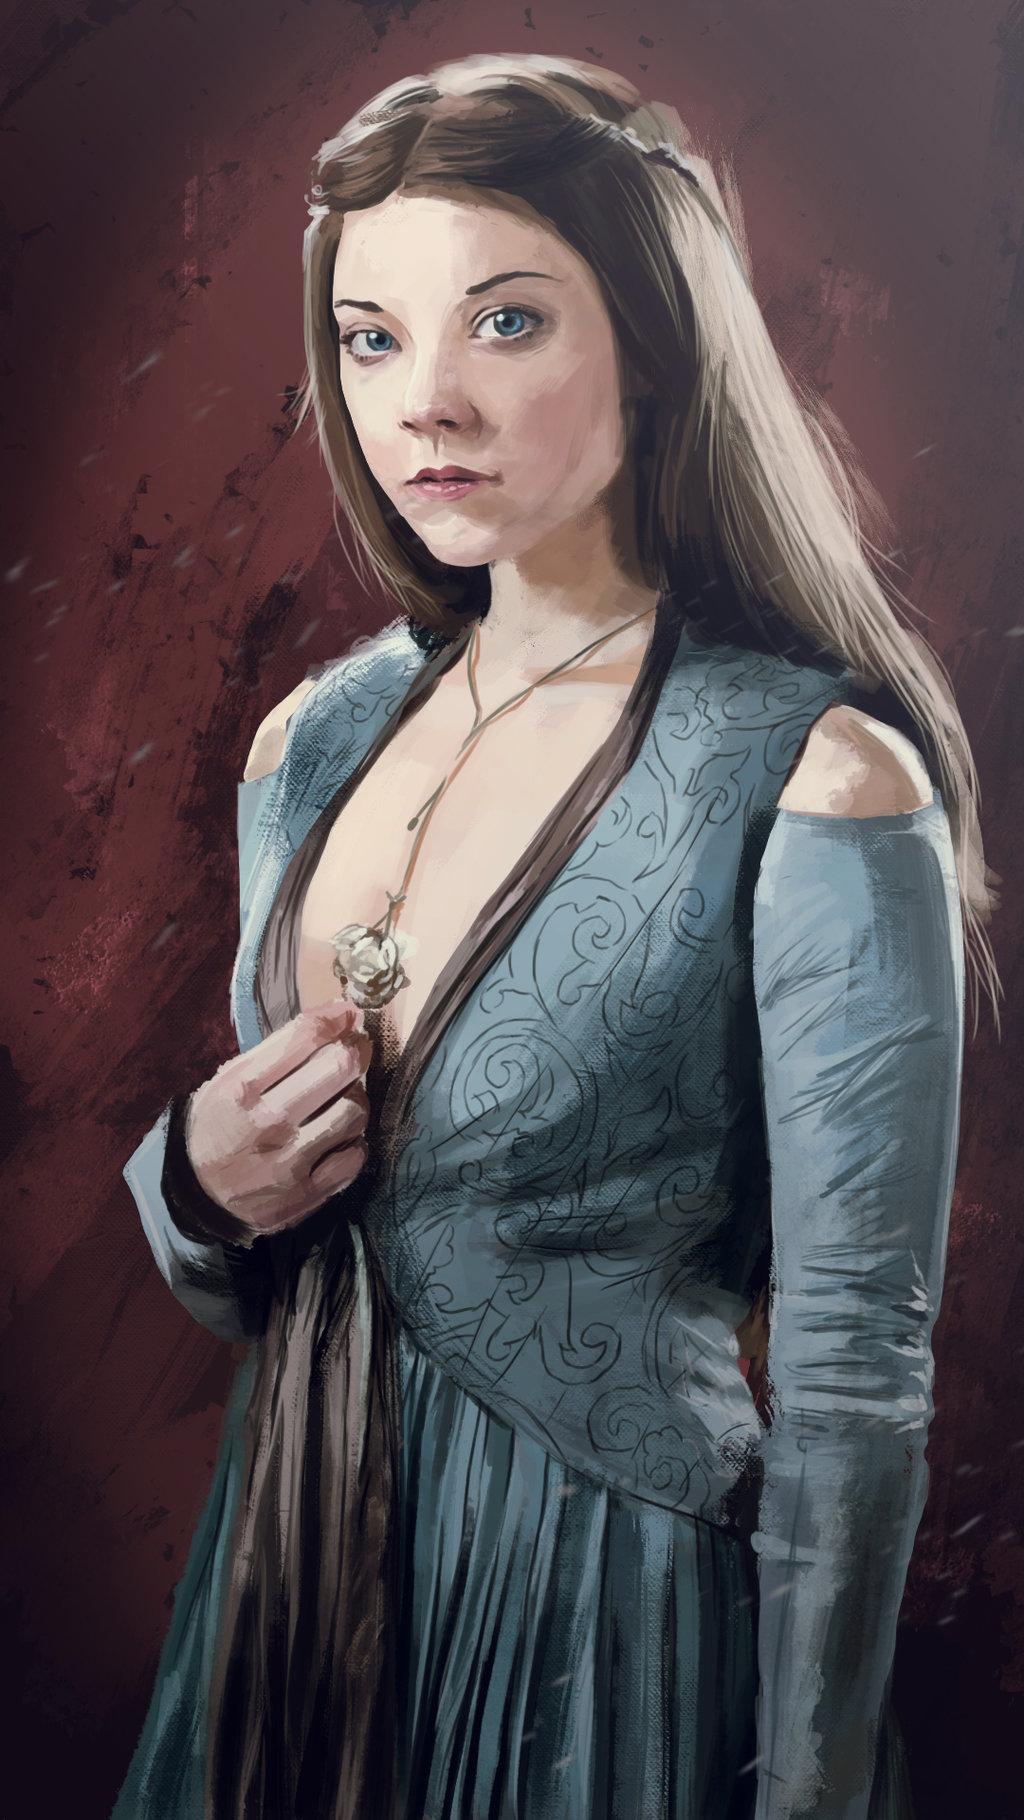 GoT Fanart - Margaery Tyrell